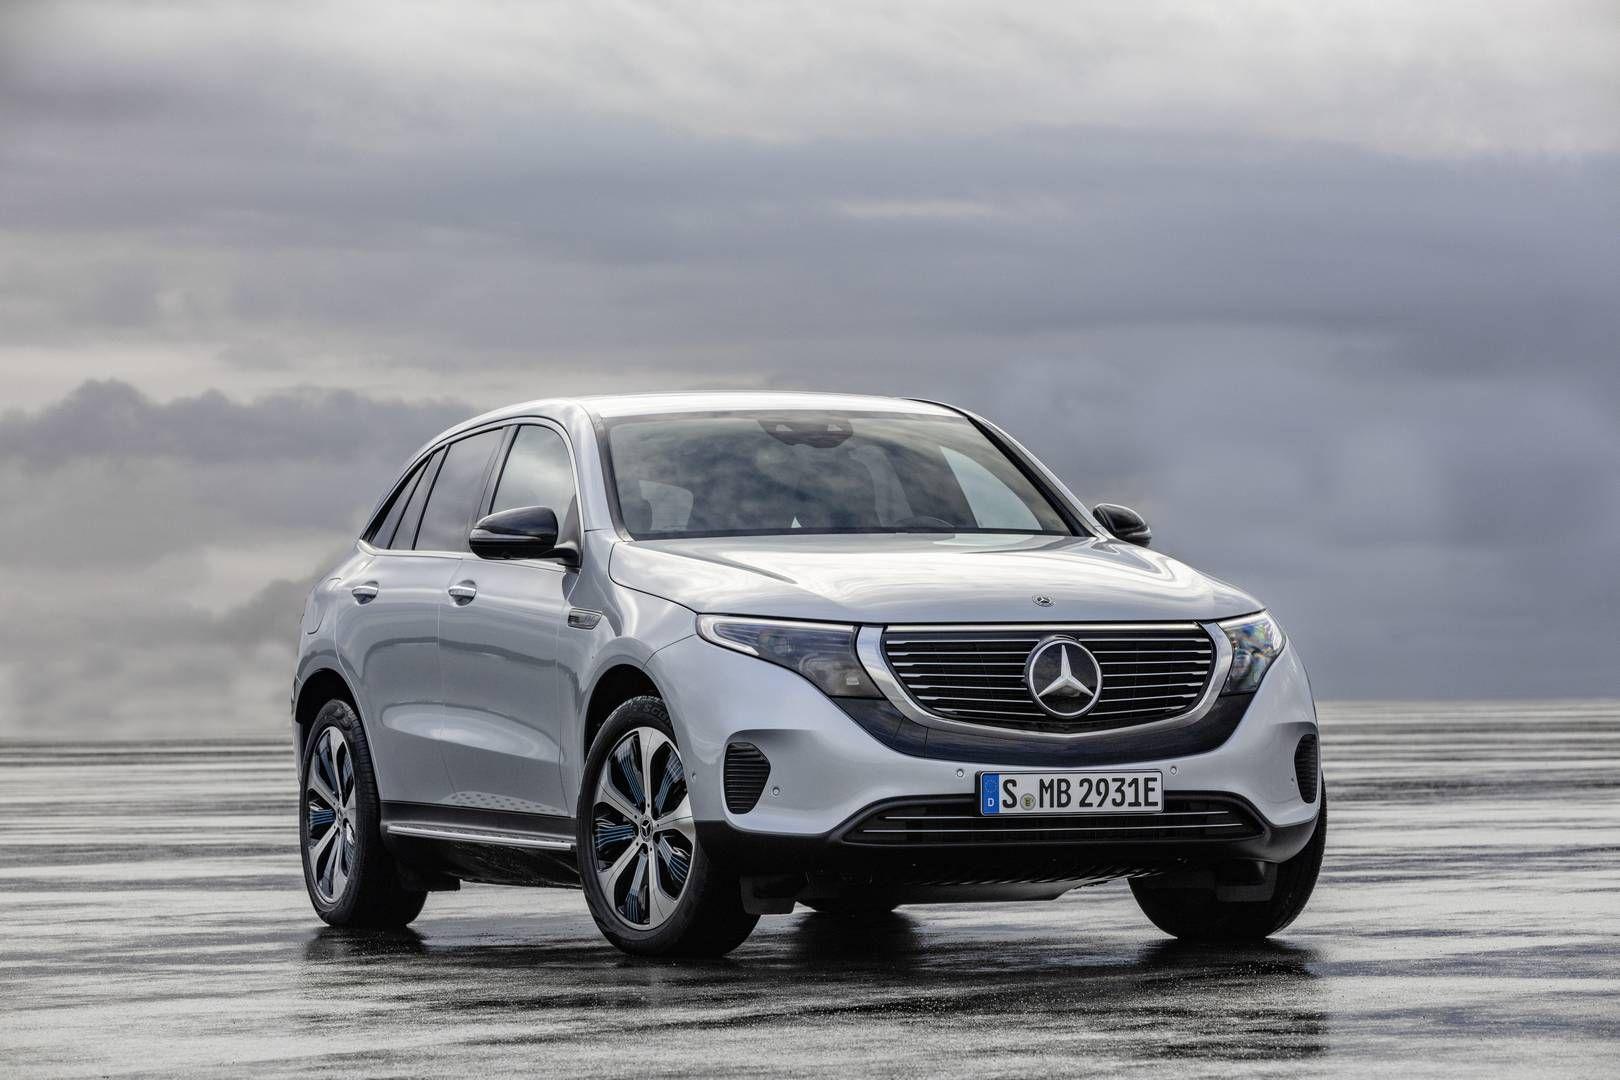 Mercedes Benz Eqc Revealed Full Electric Suv Neoadviser Car Carnews